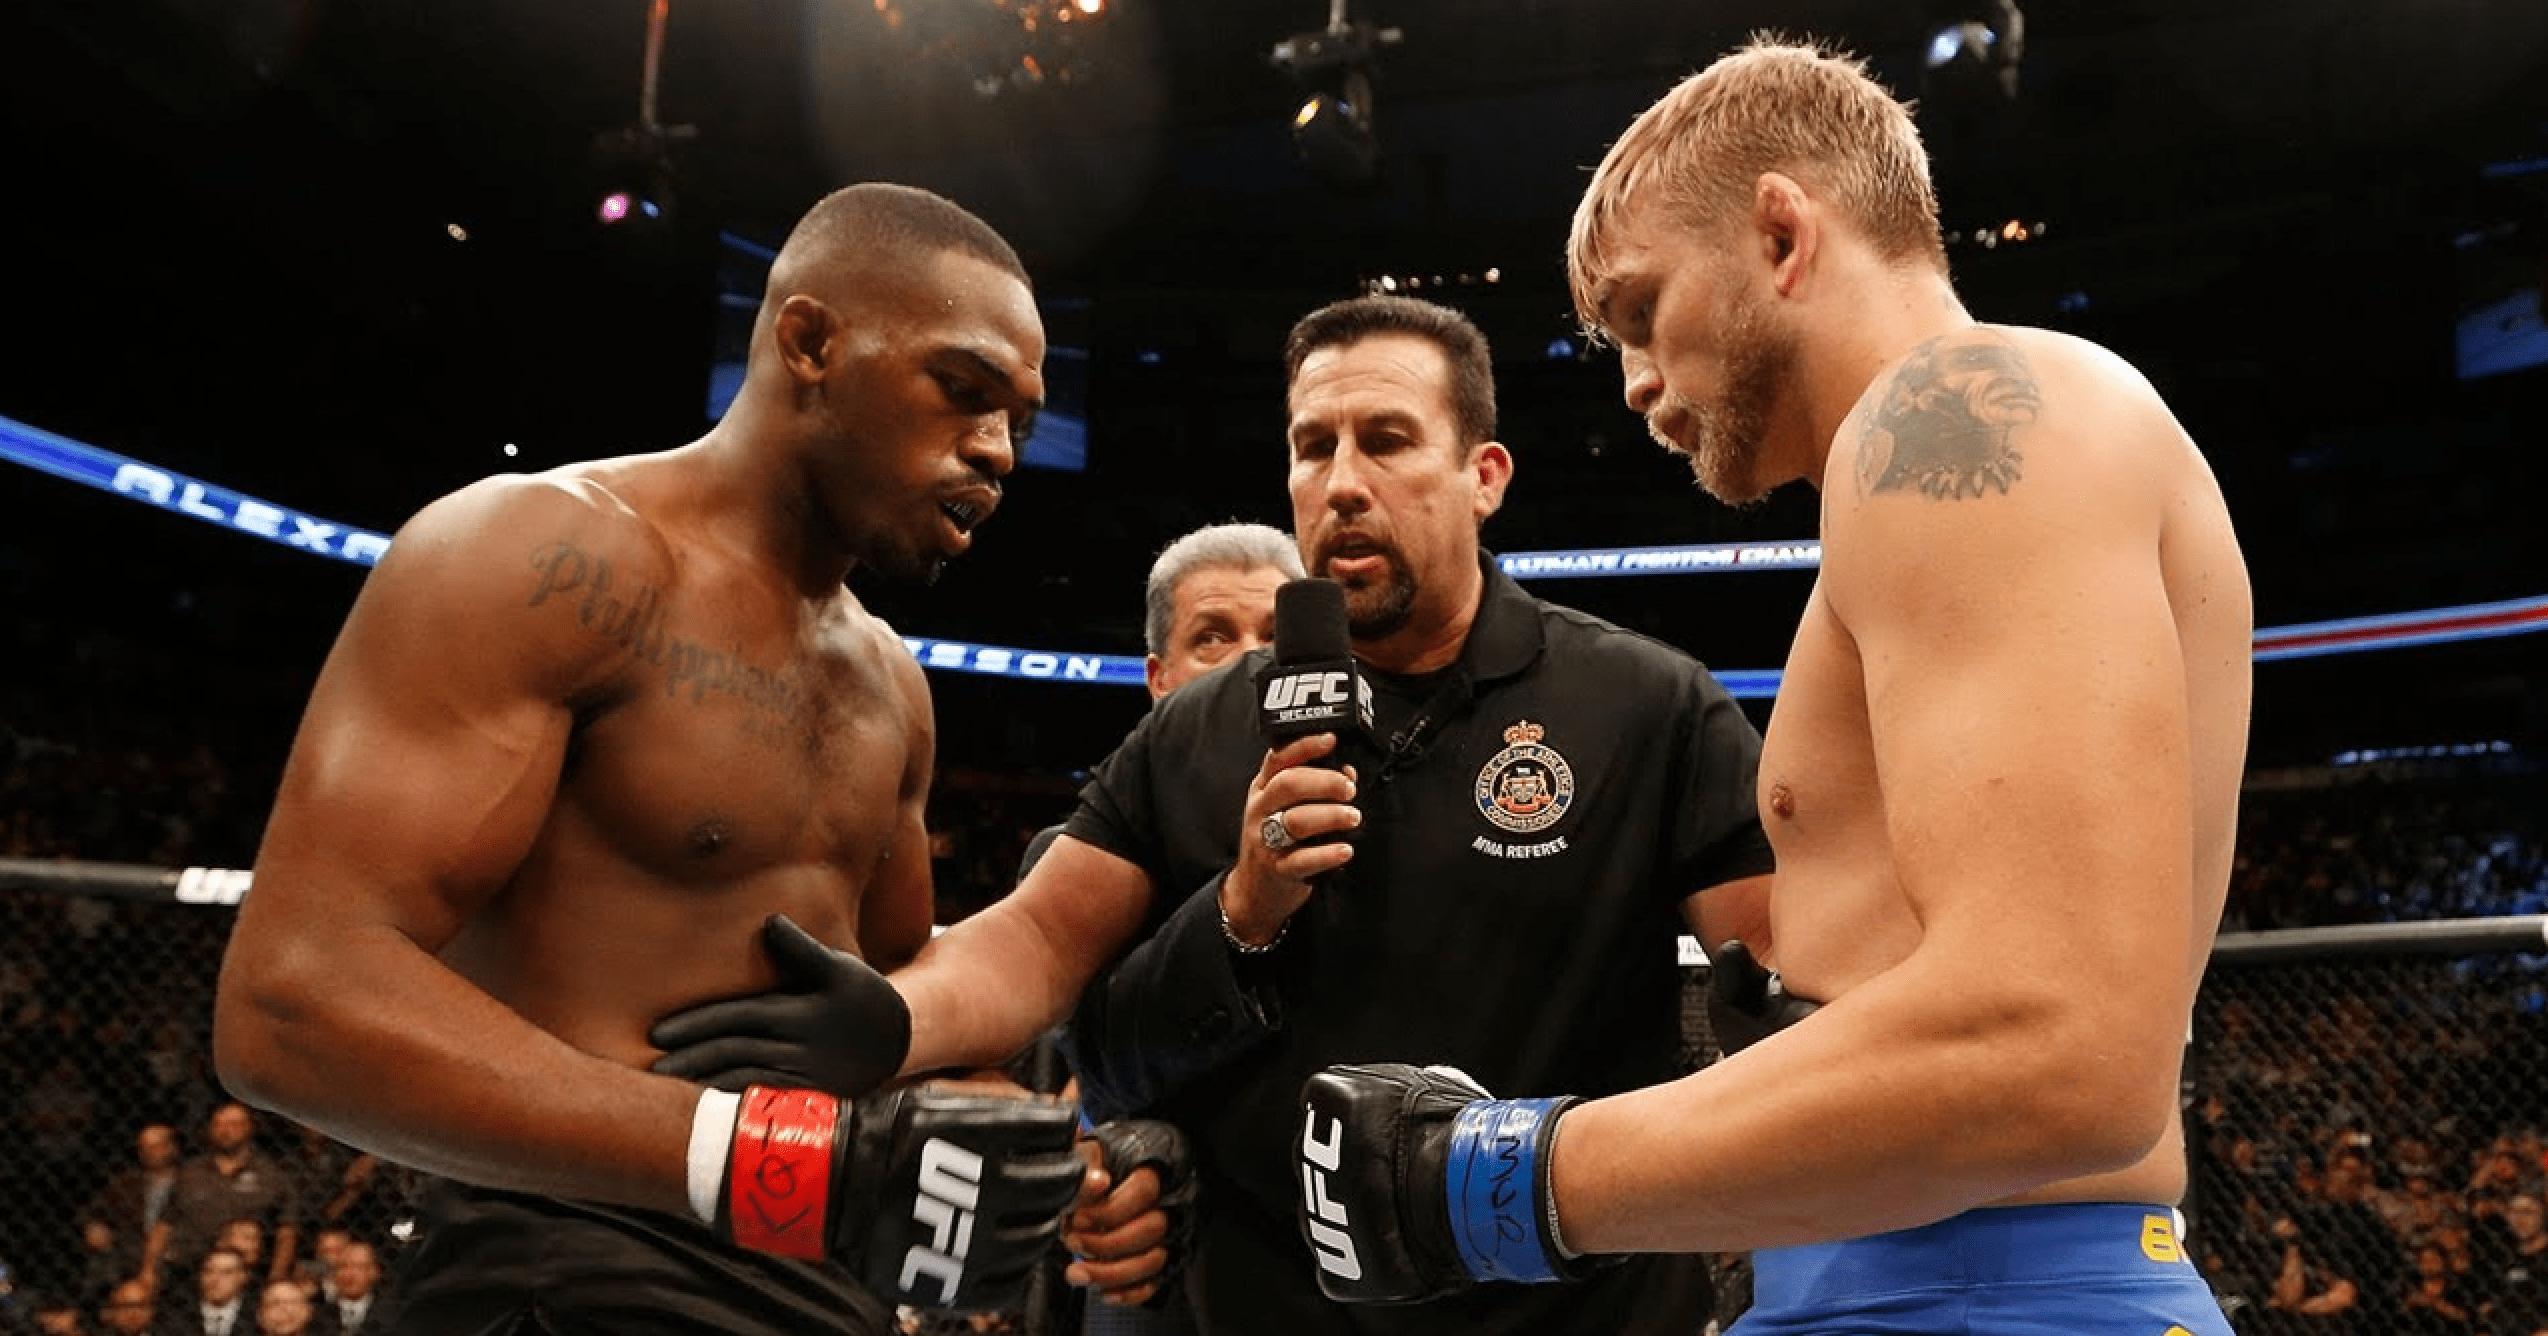 John McCarthy: Jon Jones Would've Lost At UFC 165 If I Wasn't Reffing